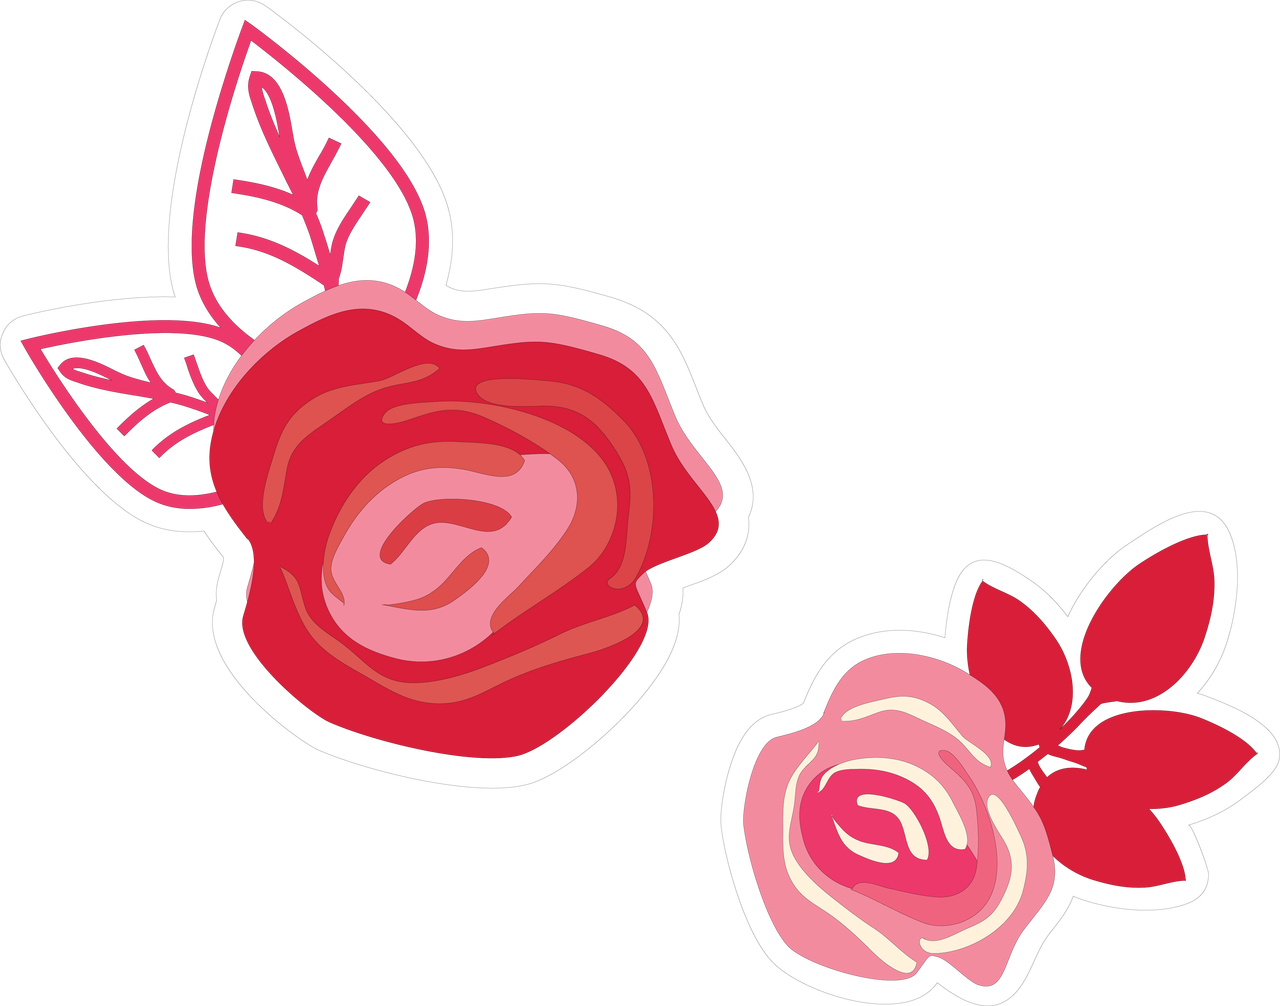 Valentine Flower Print & Cut File